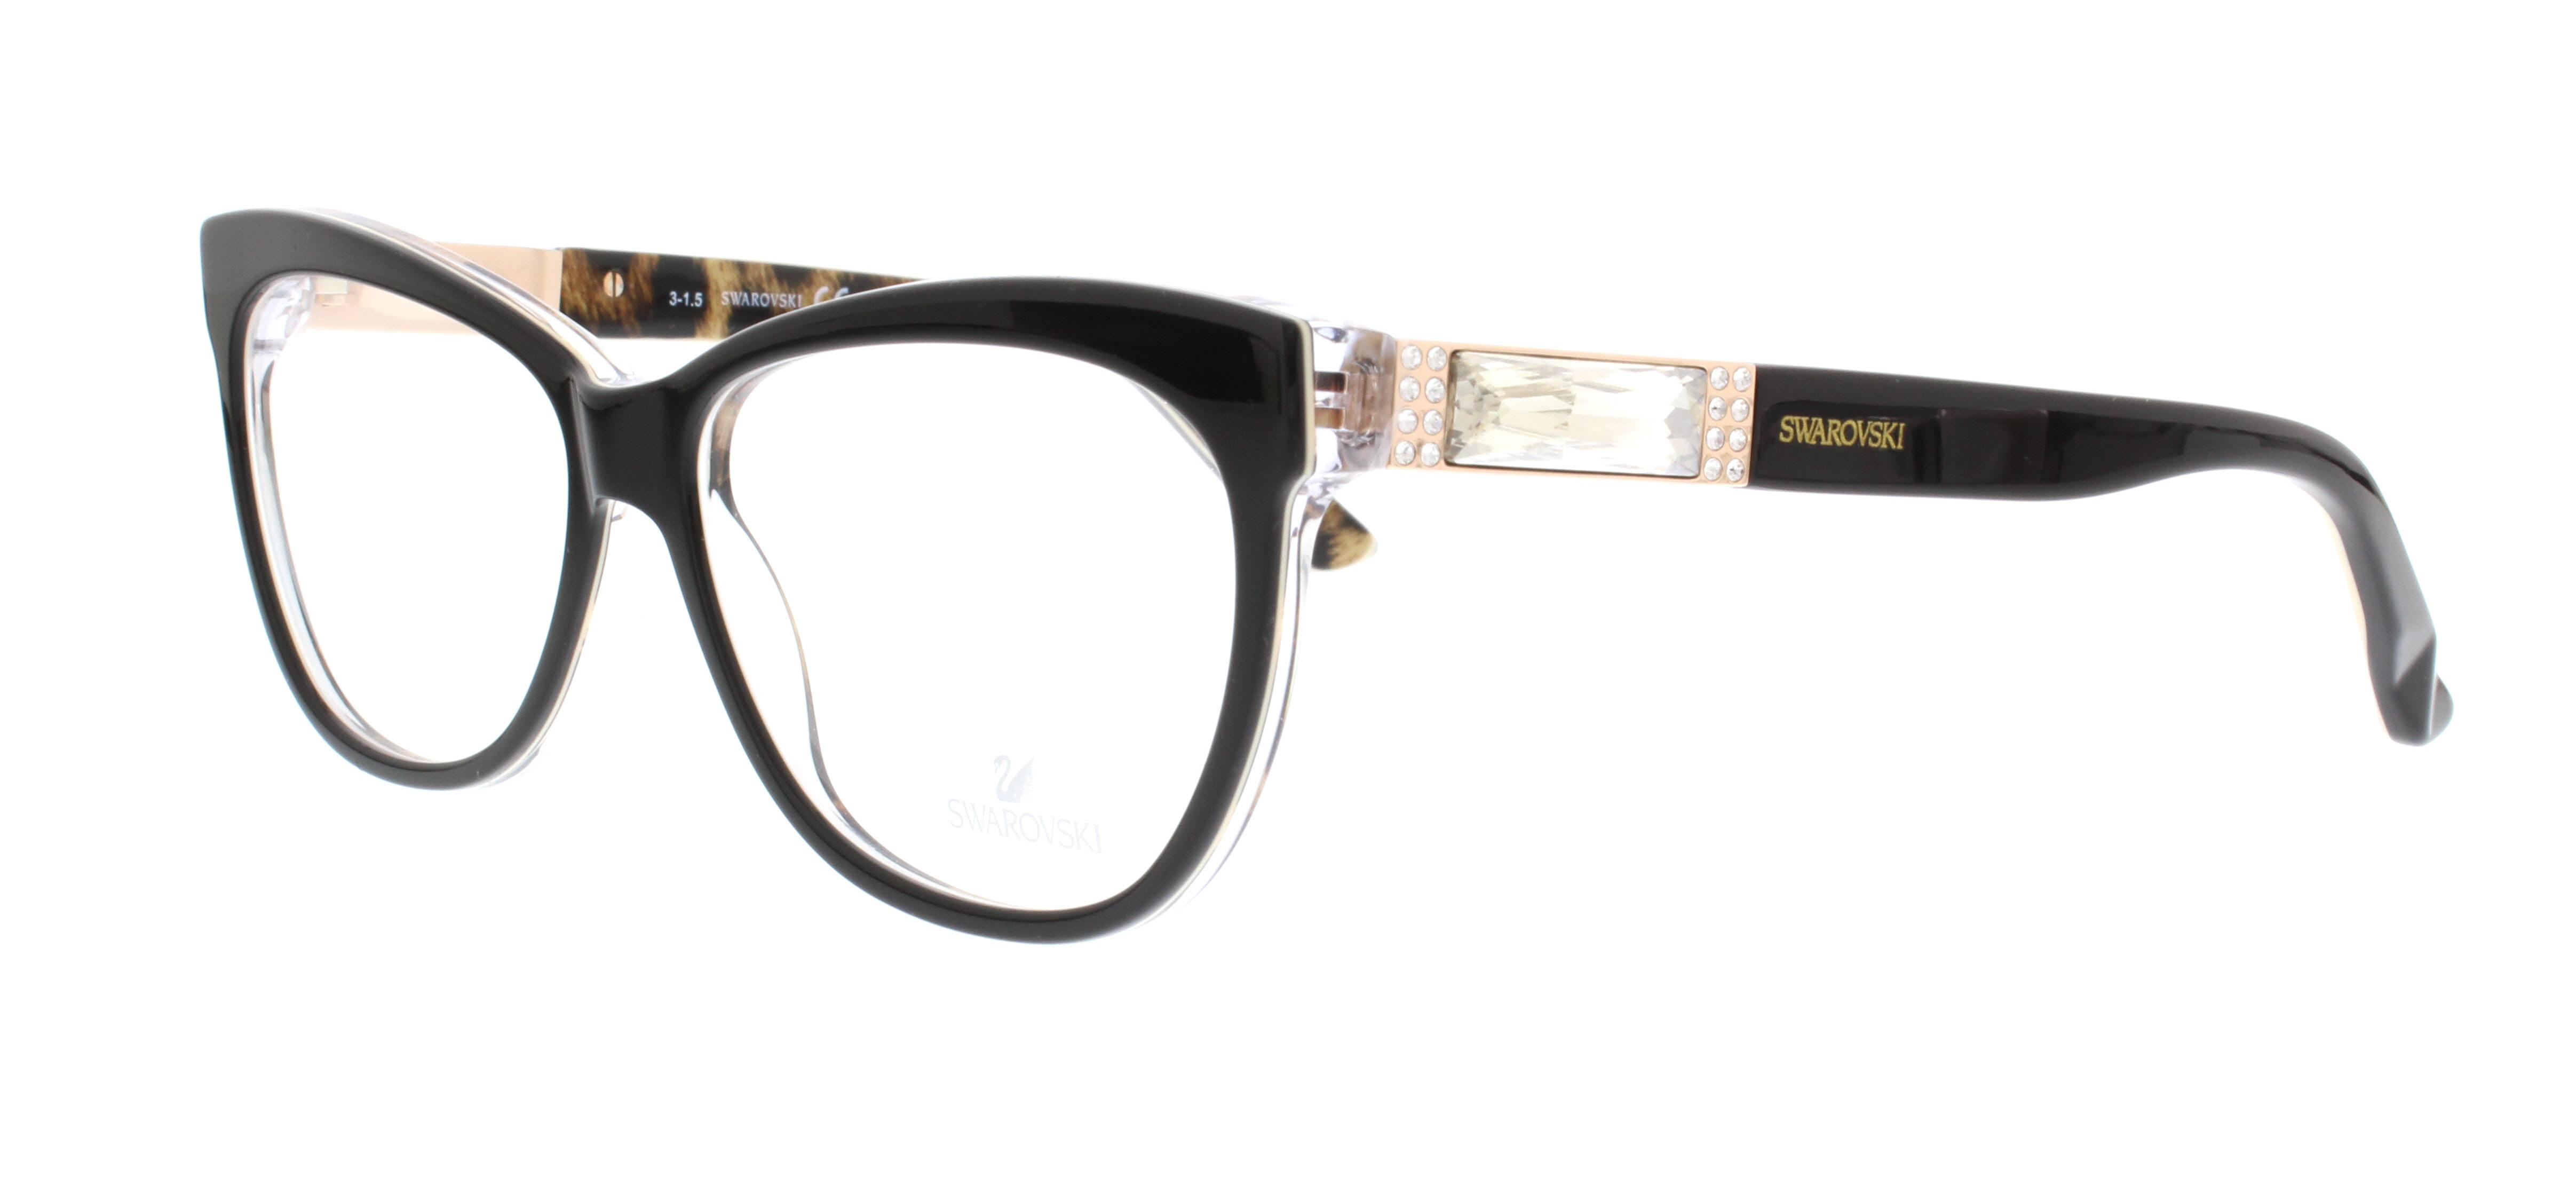 Modern Swarovski Eyeglass Frames Inspiration - Picture Frame Ideas ...